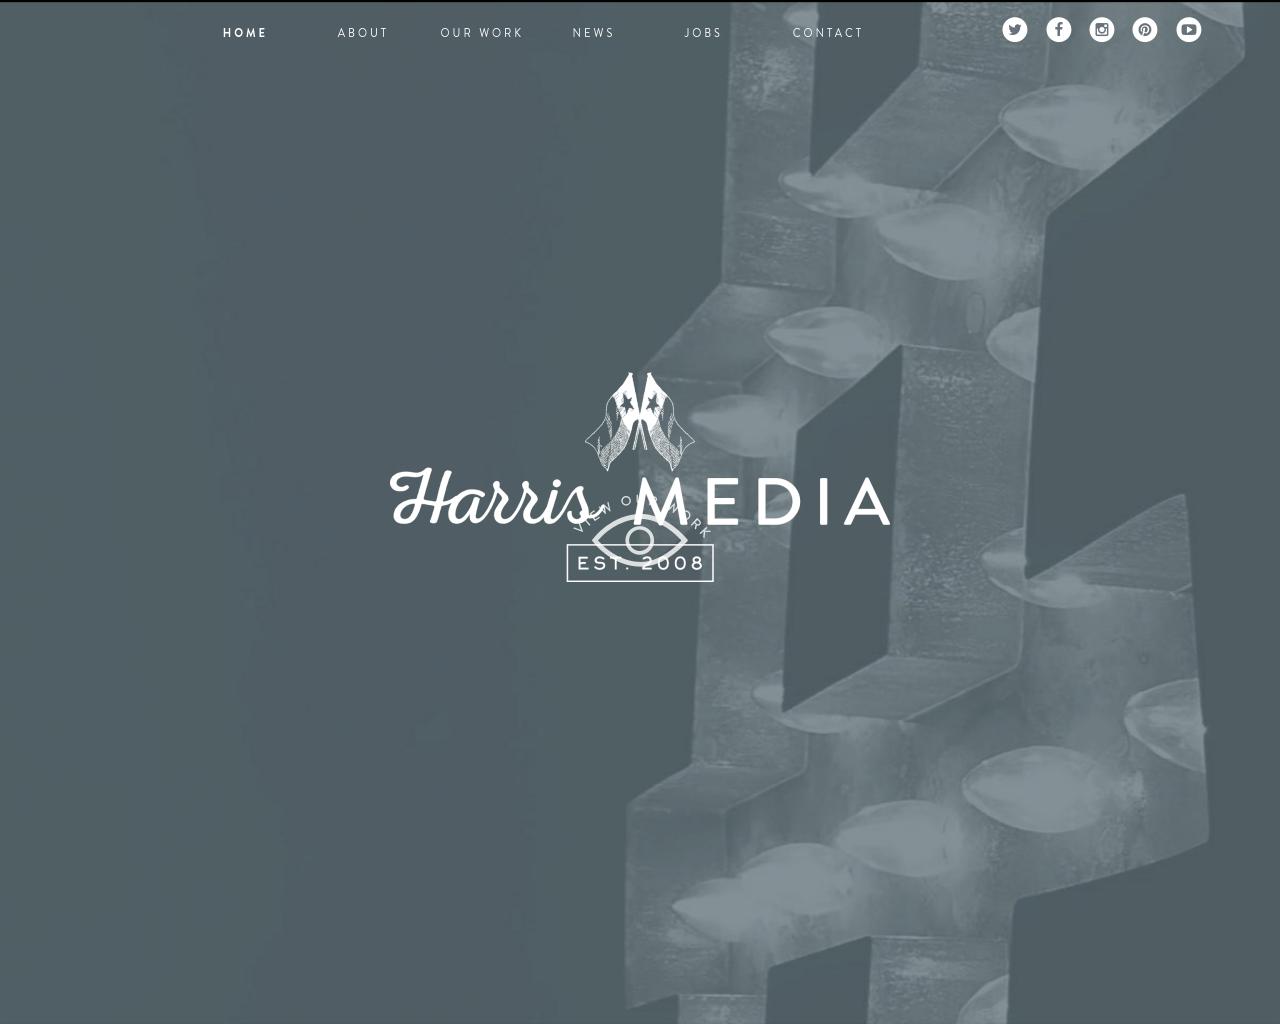 HARRIS-MEDIA-Advertising-Reviews-Pricing